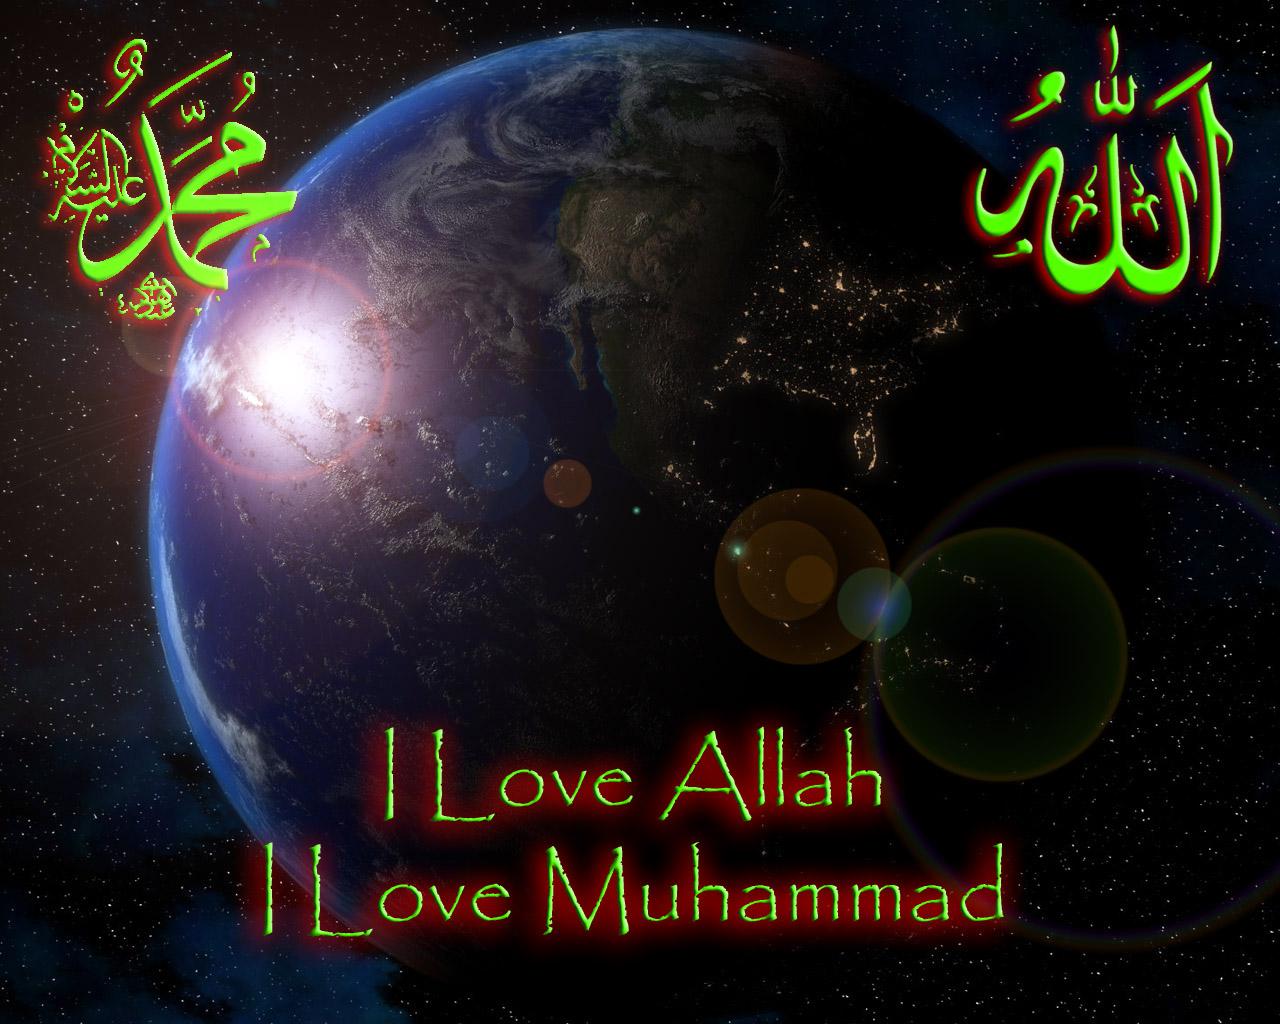 And add free mobile wallpaper kaligrafi devoted Sokak no discover art online